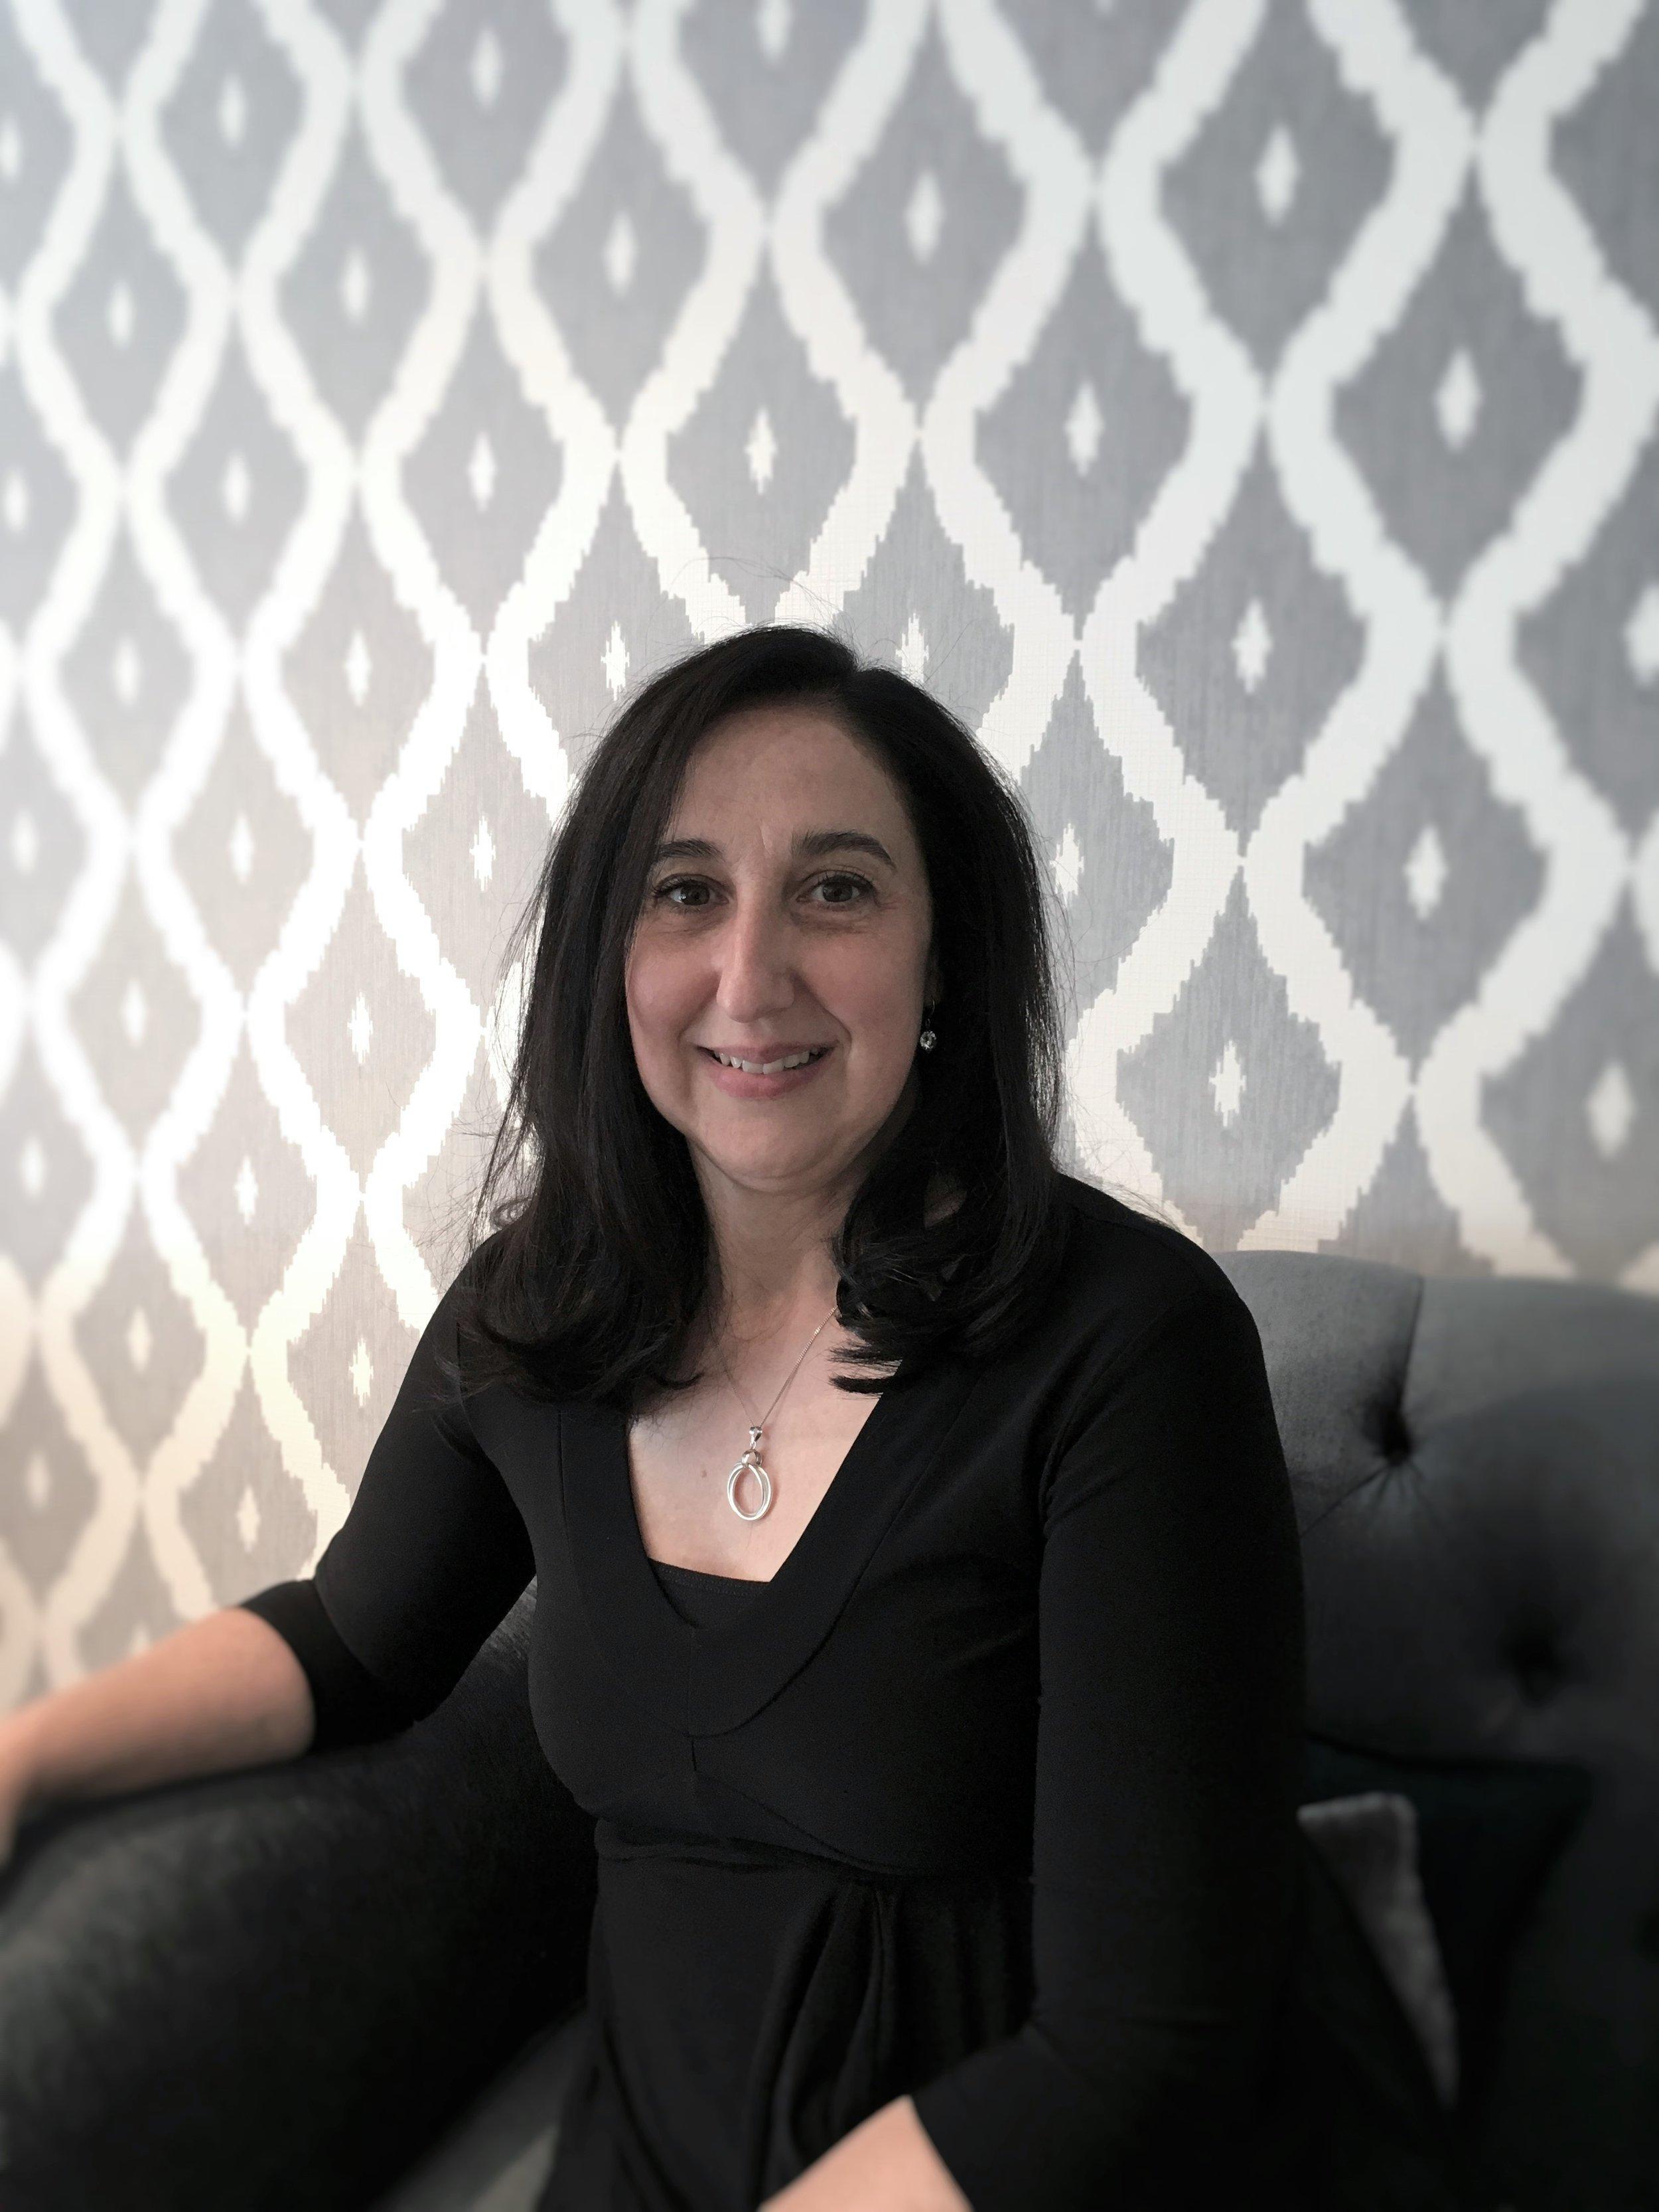 Paulette // Spa Owner - Esthetician